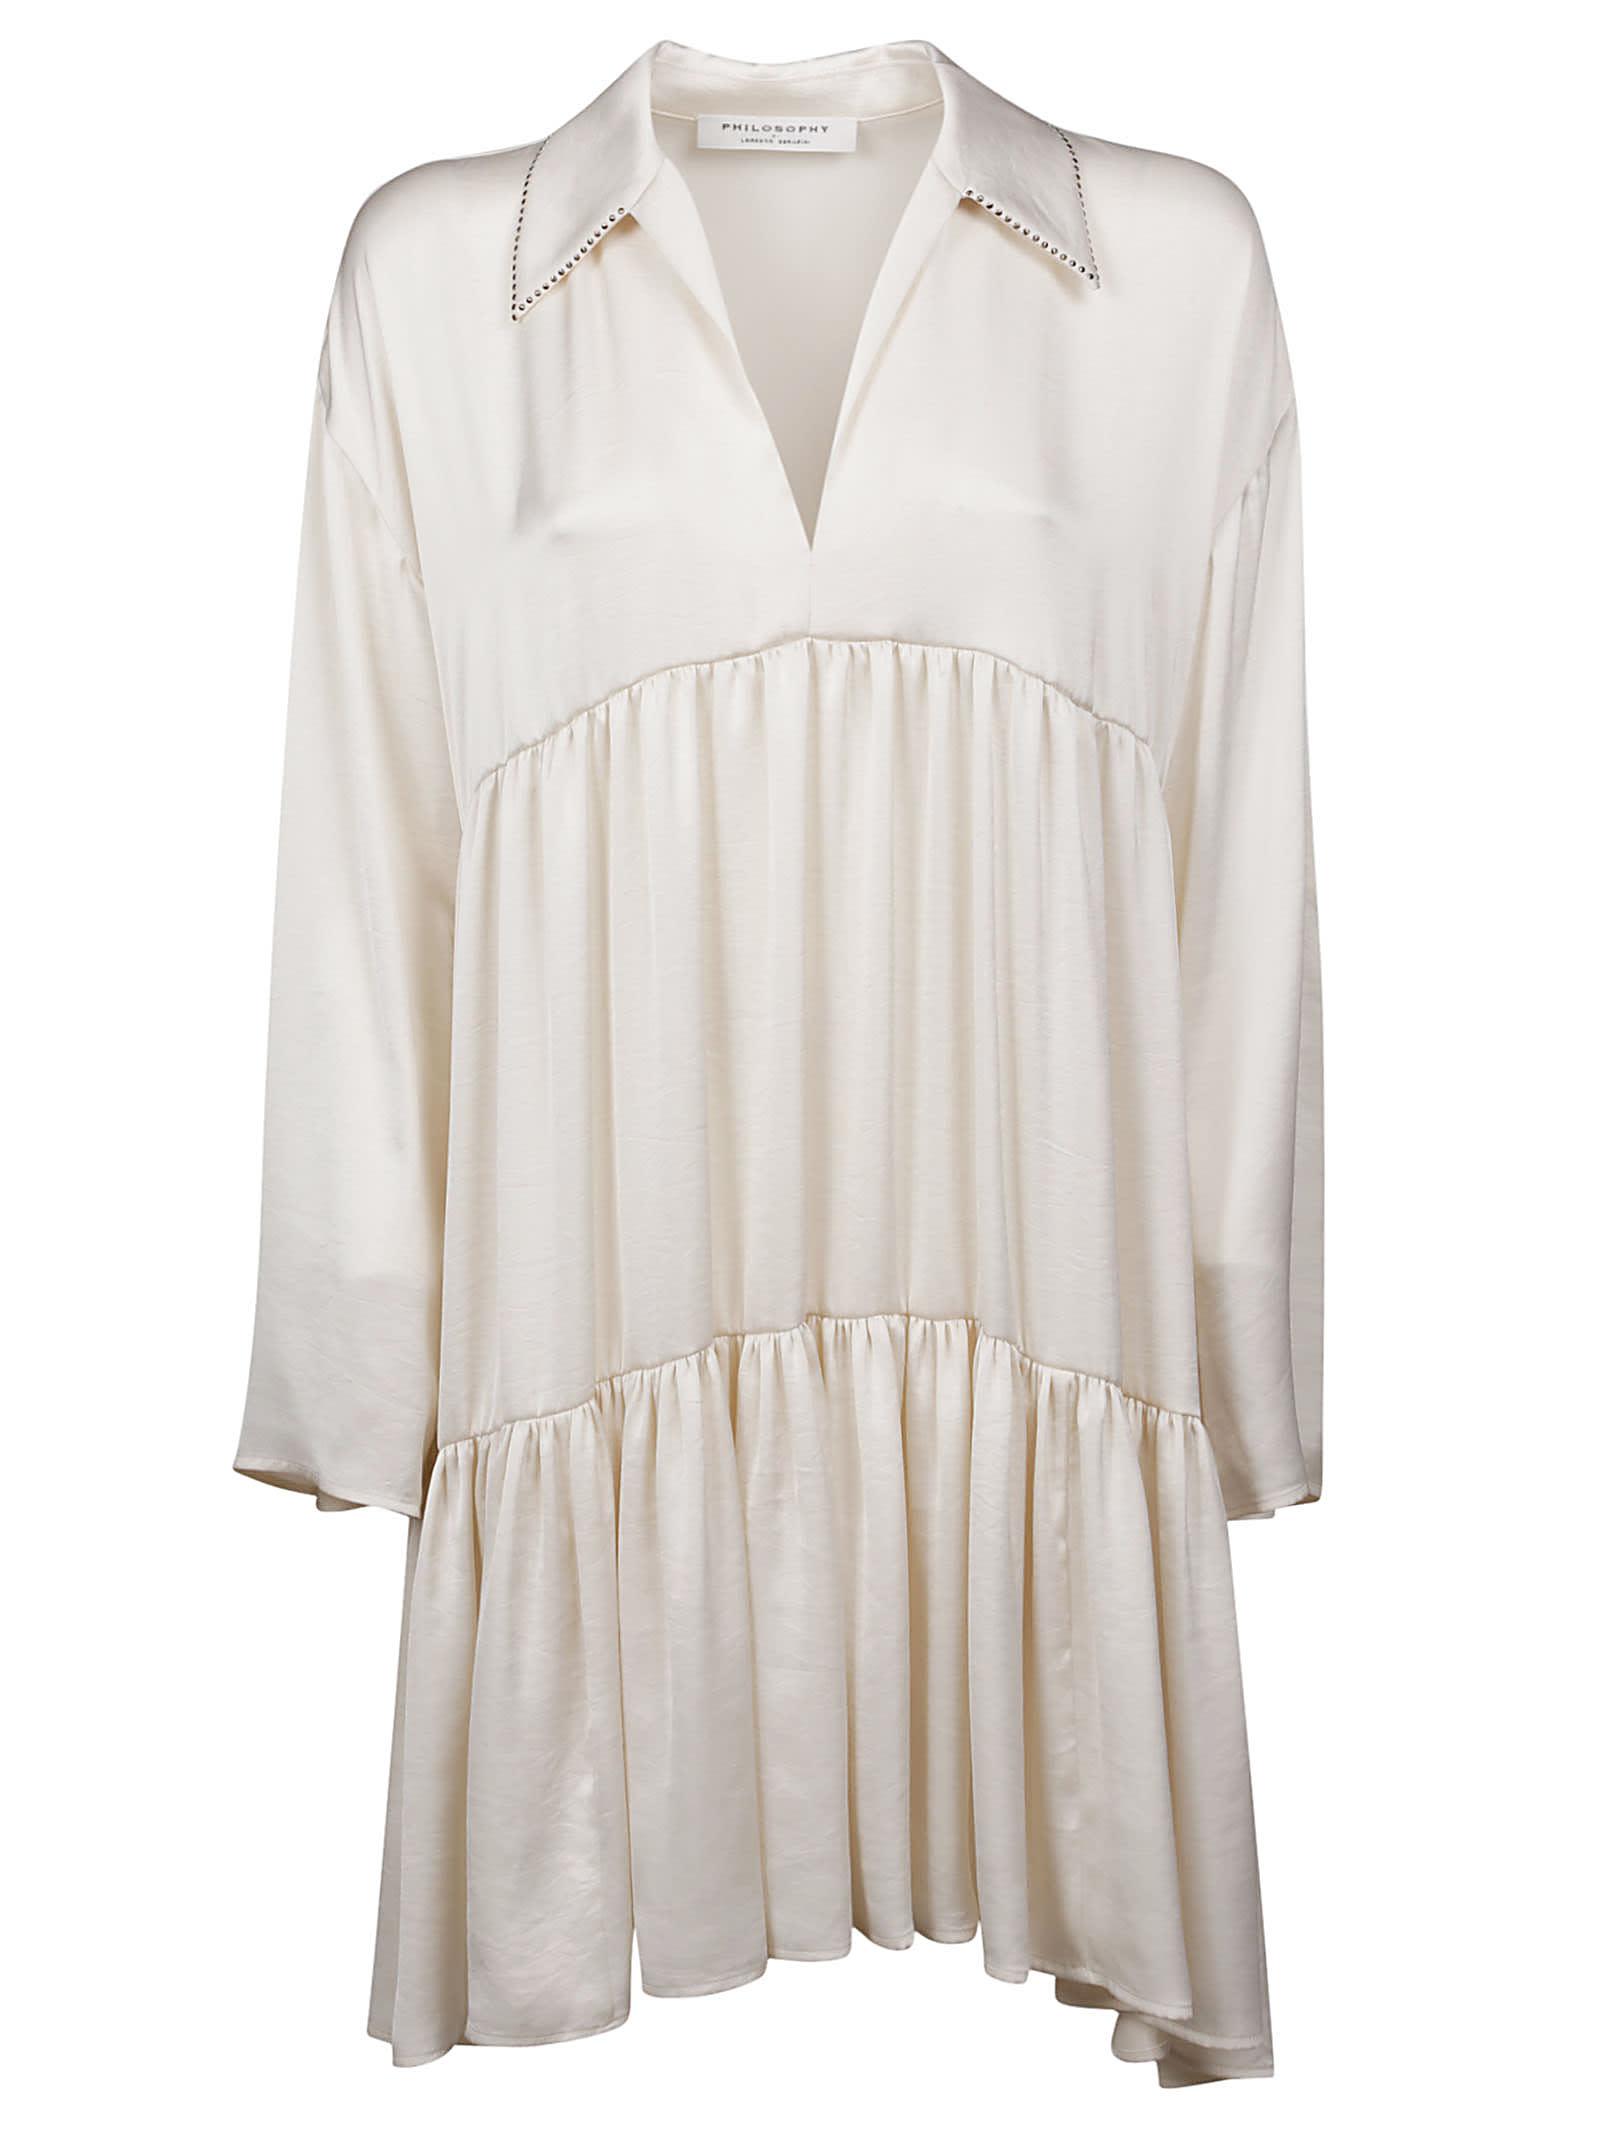 Buy Philosophy di Lorenzo Serafini Flared Dress online, shop Philosophy di Lorenzo Serafini with free shipping